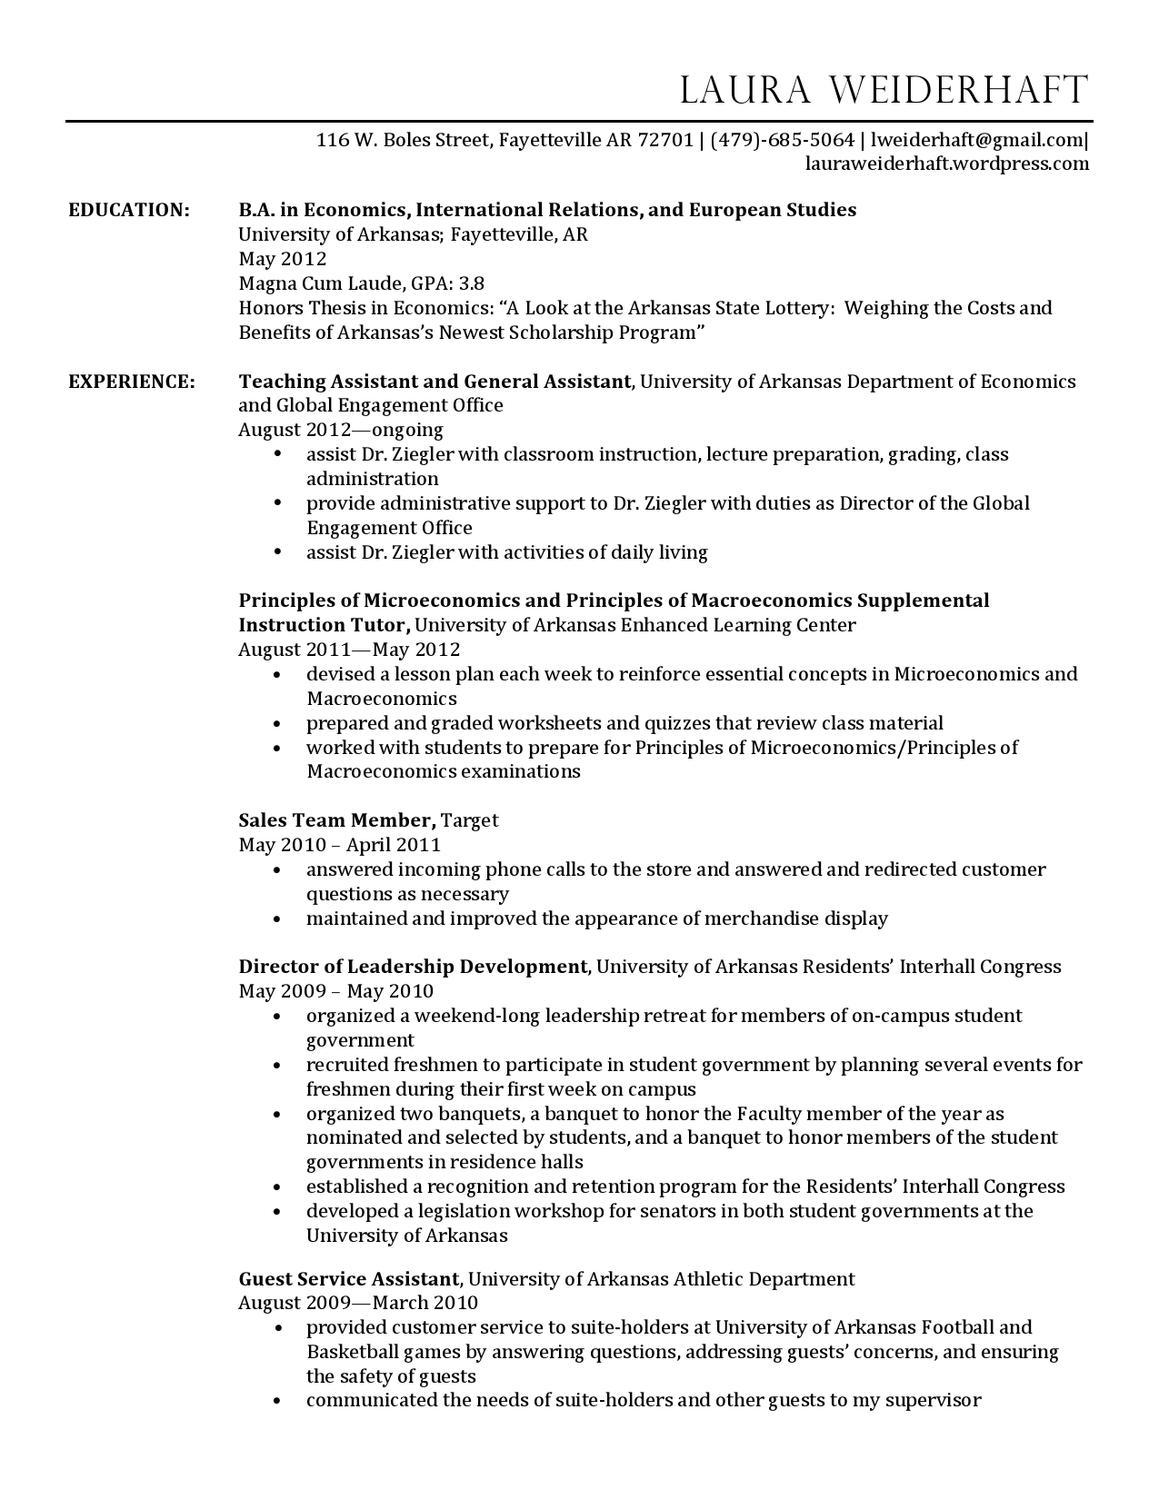 Best Resume Center Uark Pictures Inspiration - Professional Resume ...